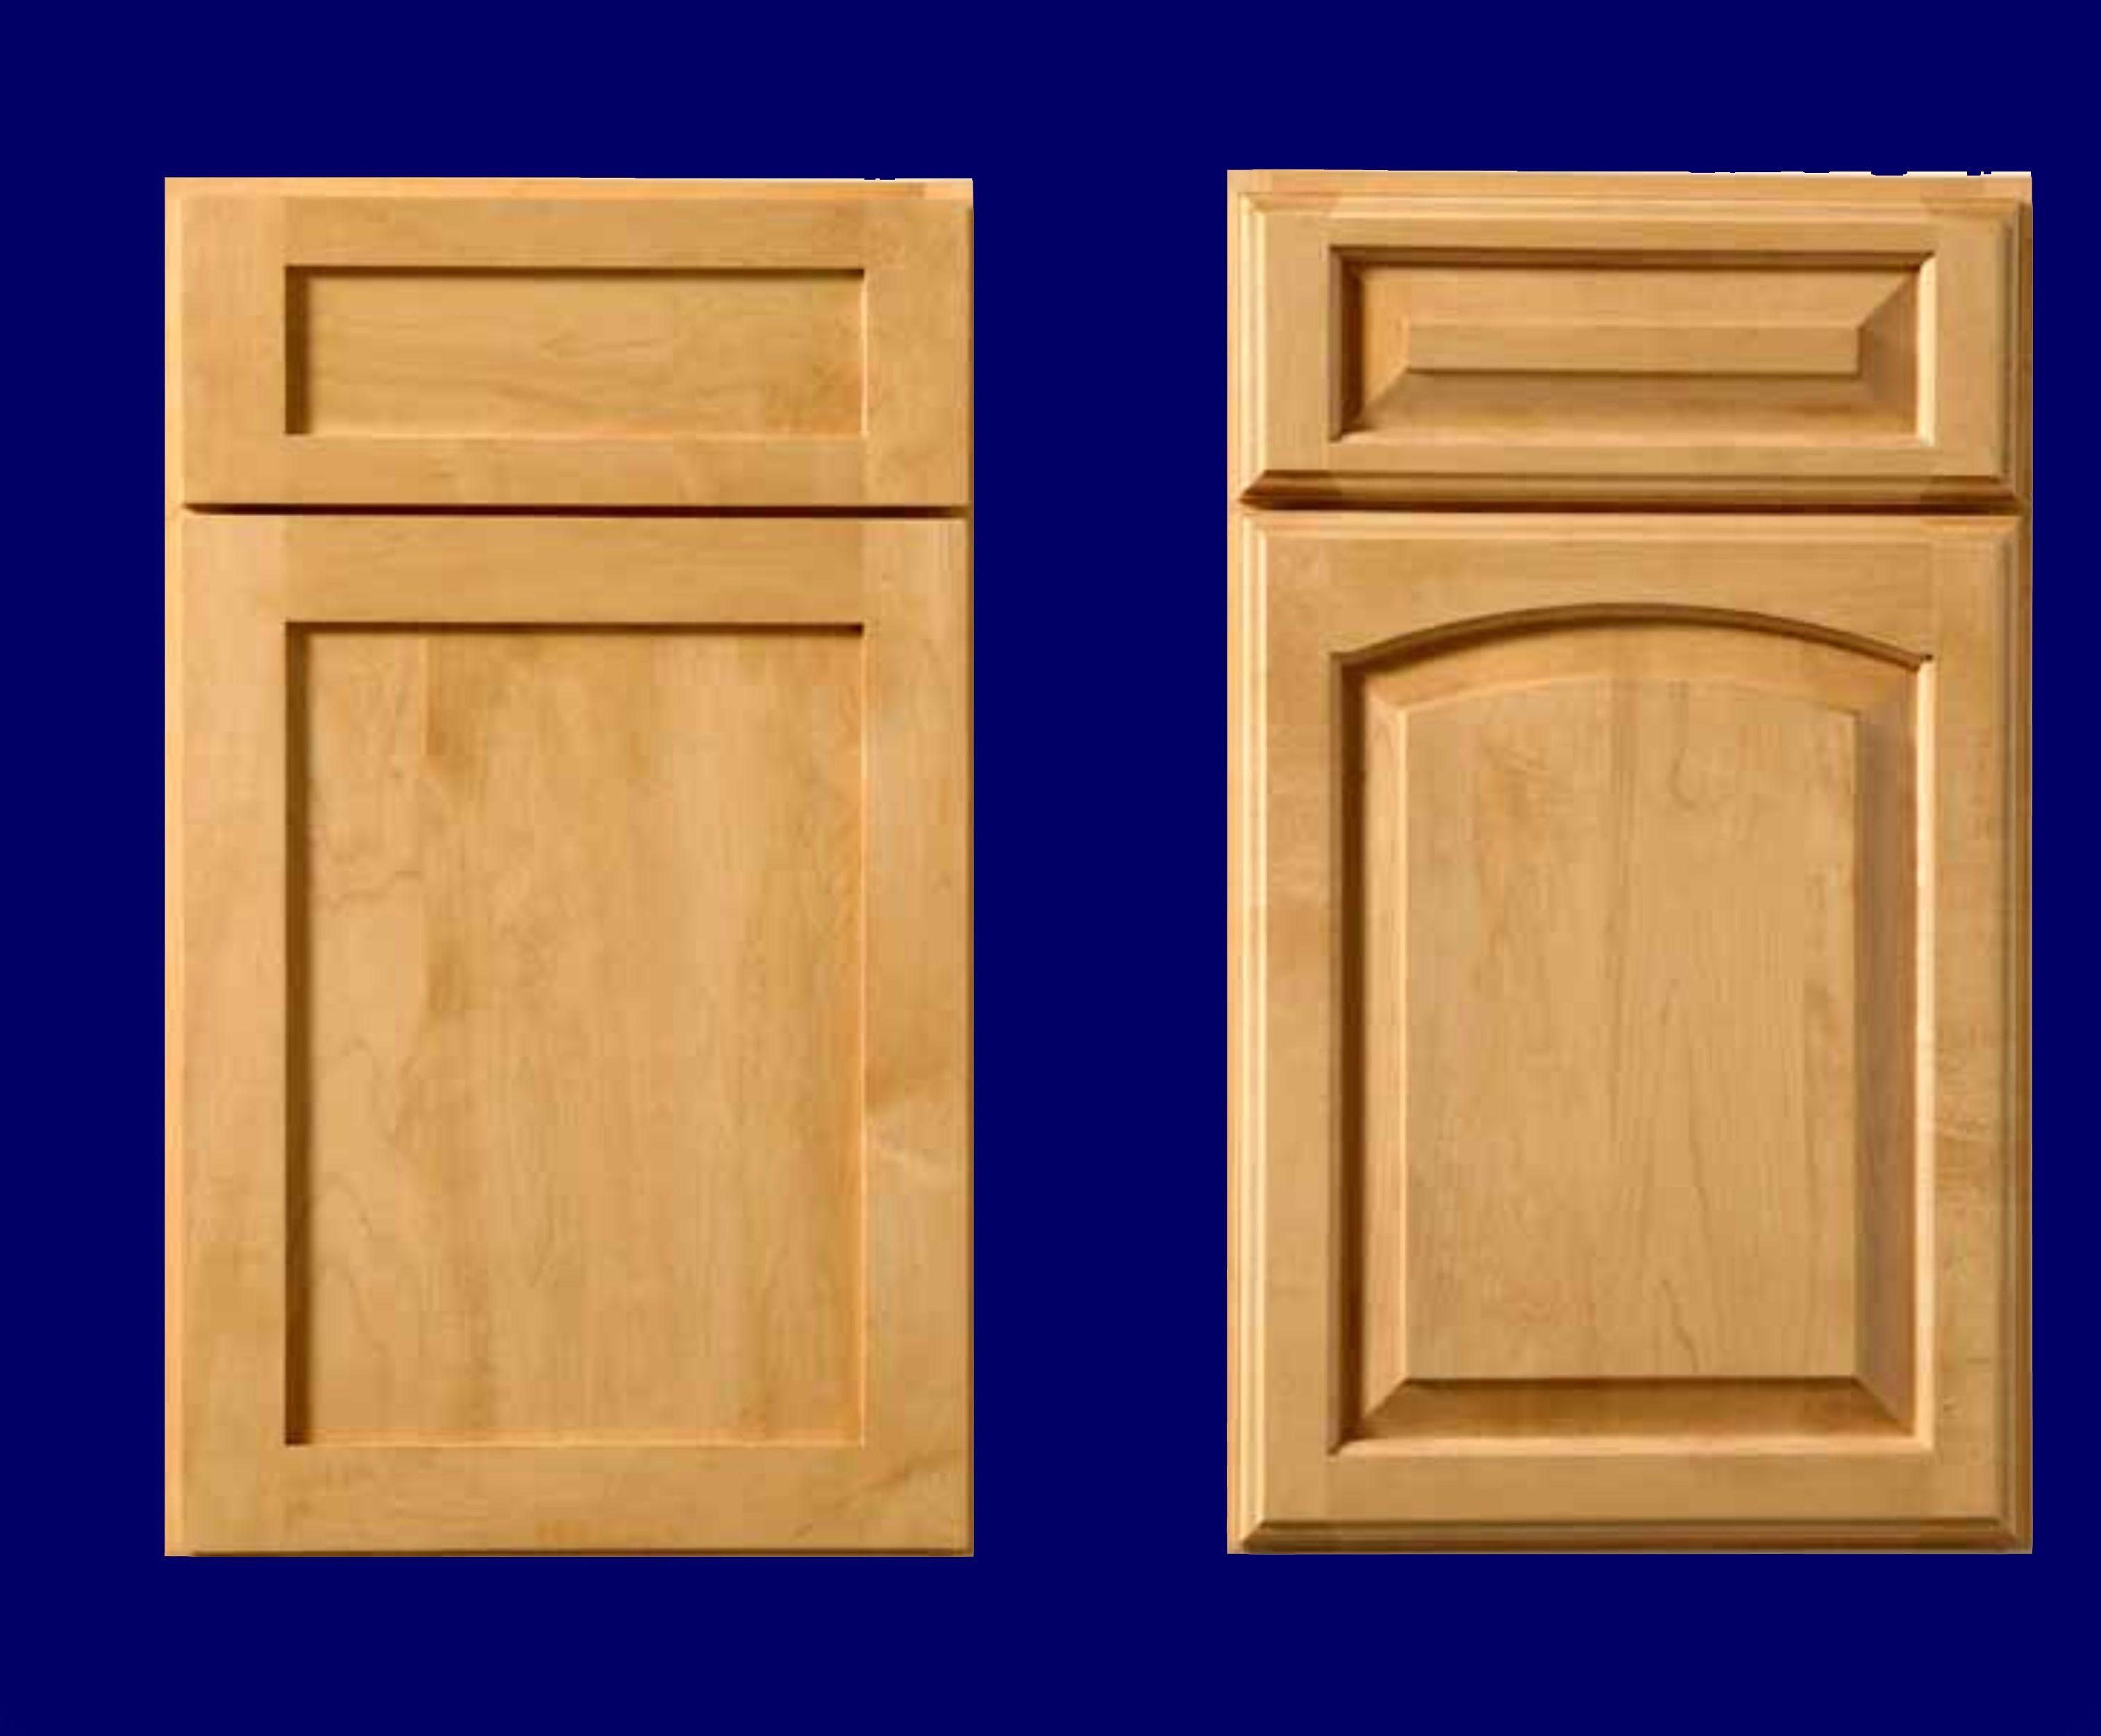 Routing Kitchen Cabinet Doors kitchencabinets